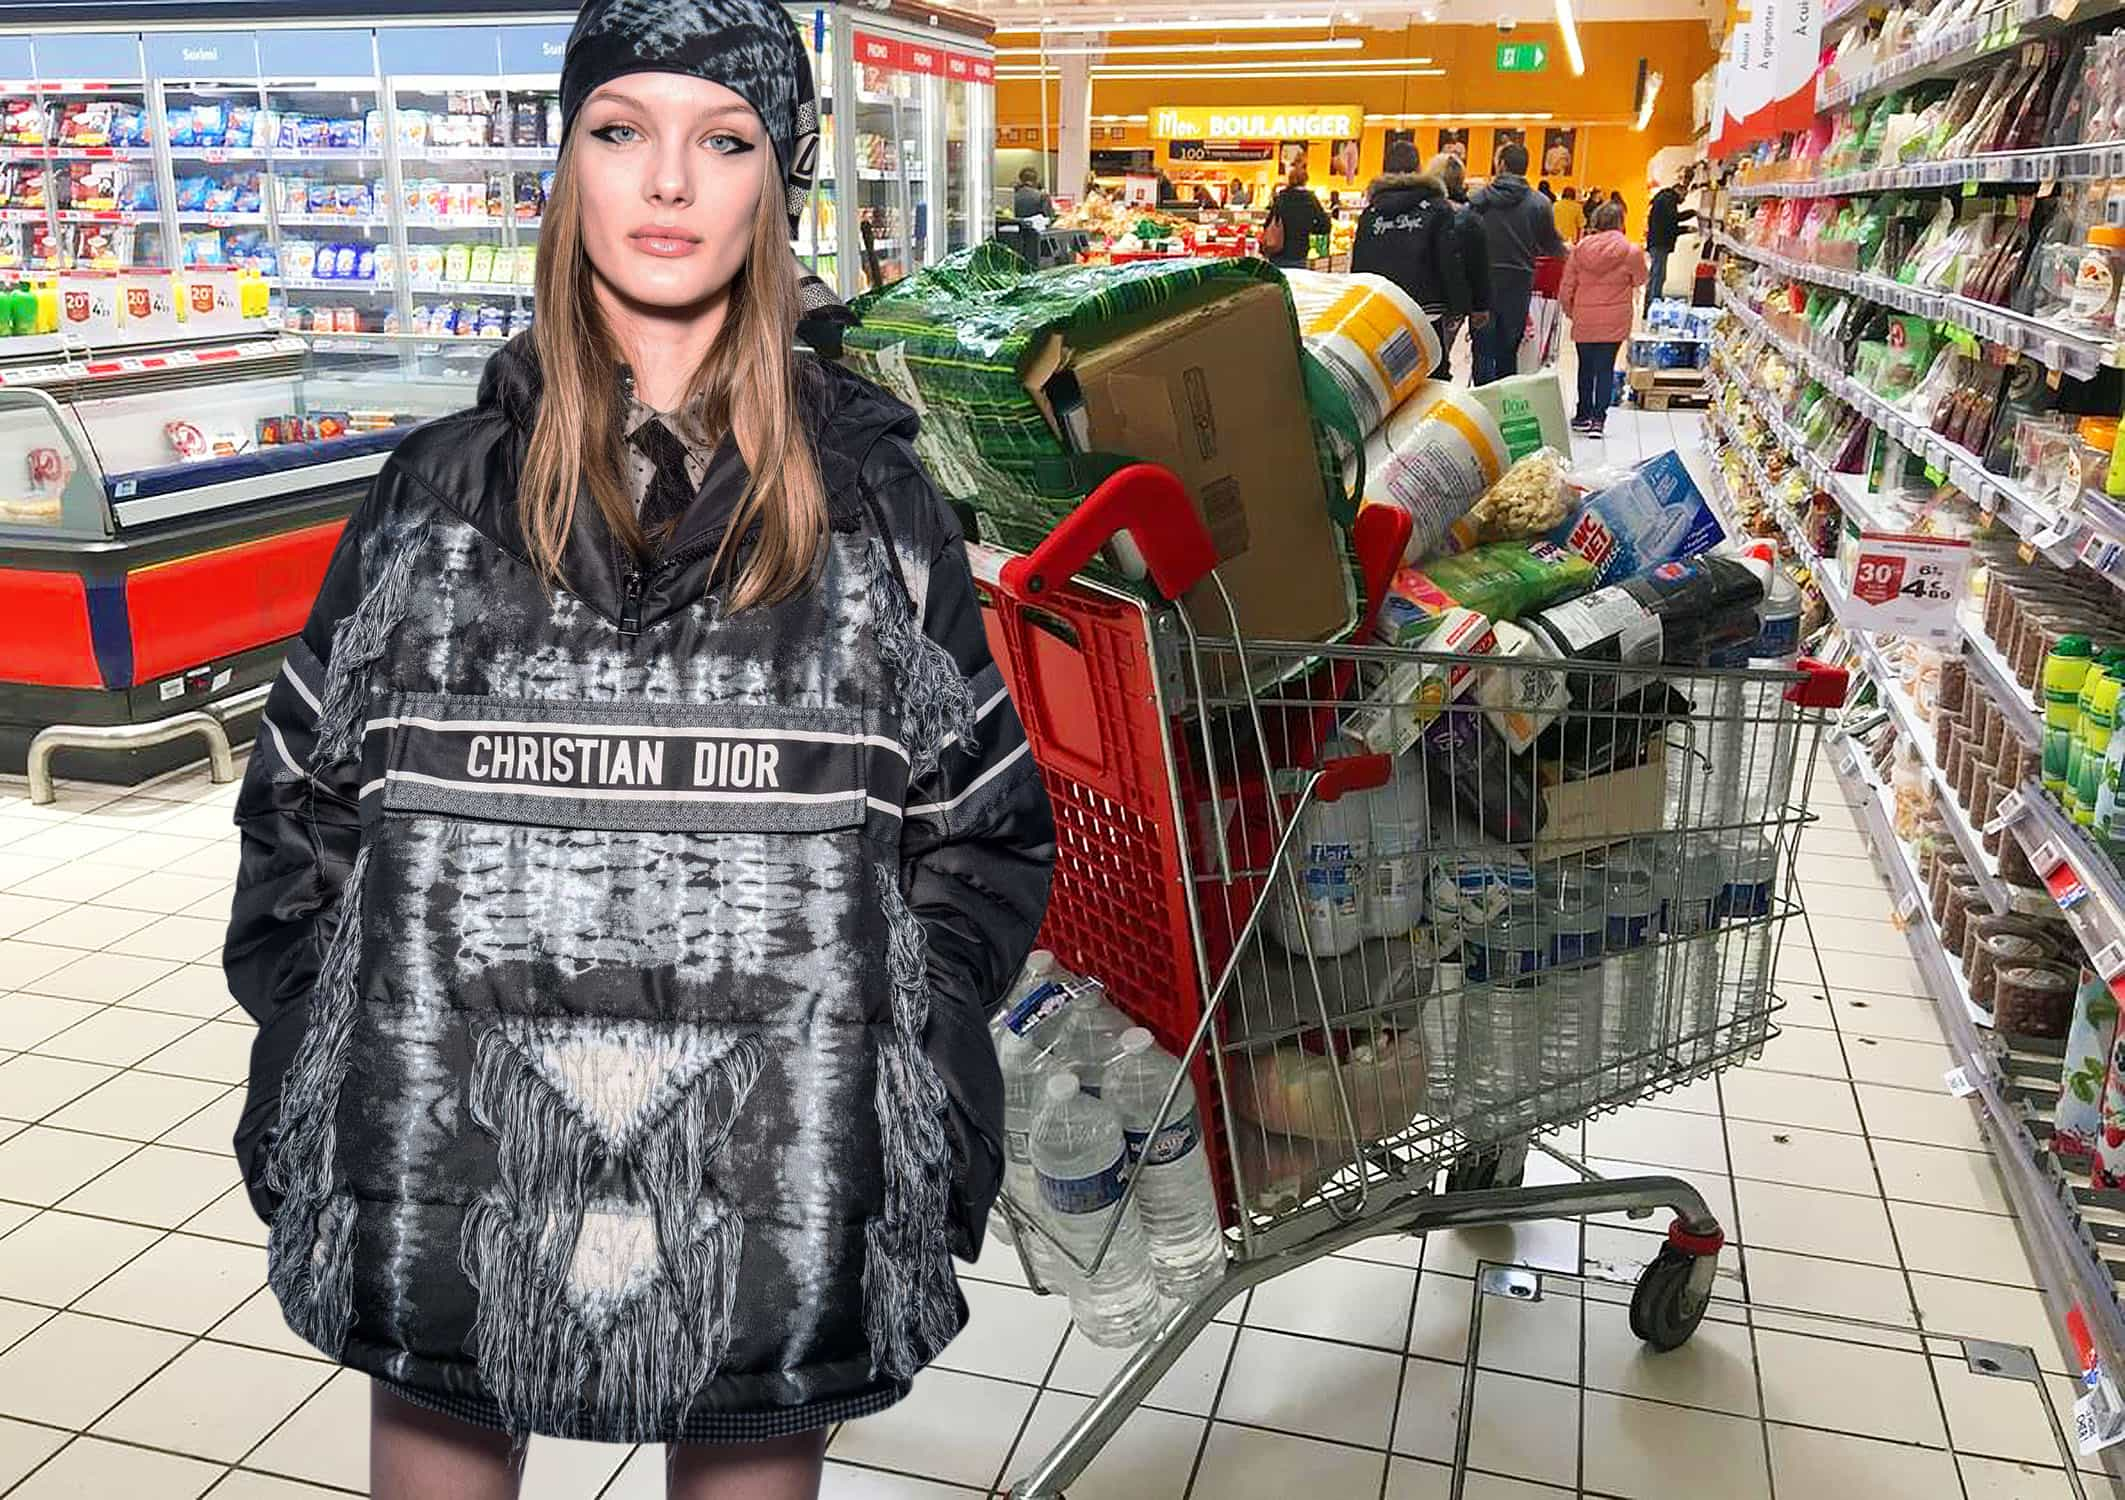 Christian Dior Fall Winter 2020-2021 - coronavirus Parisian Bobo shopping style